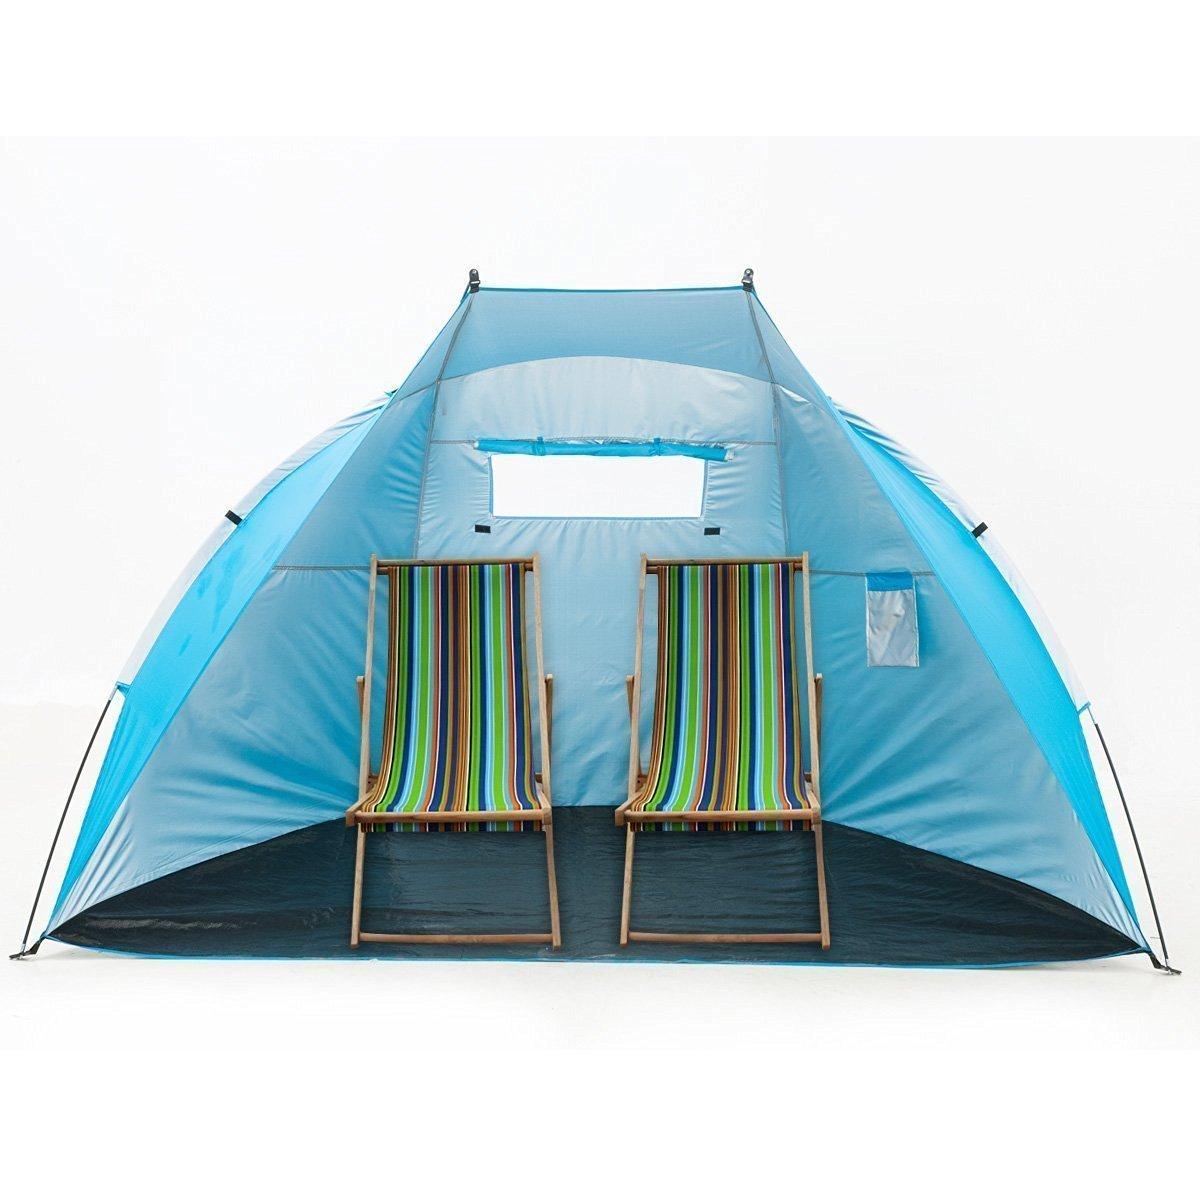 "iCorer Outdoor Portable EasyUp Beach Cabana Tent Sun Shelter Sunshade, Blue, 94.5""L x 47.2""W x 55""H"